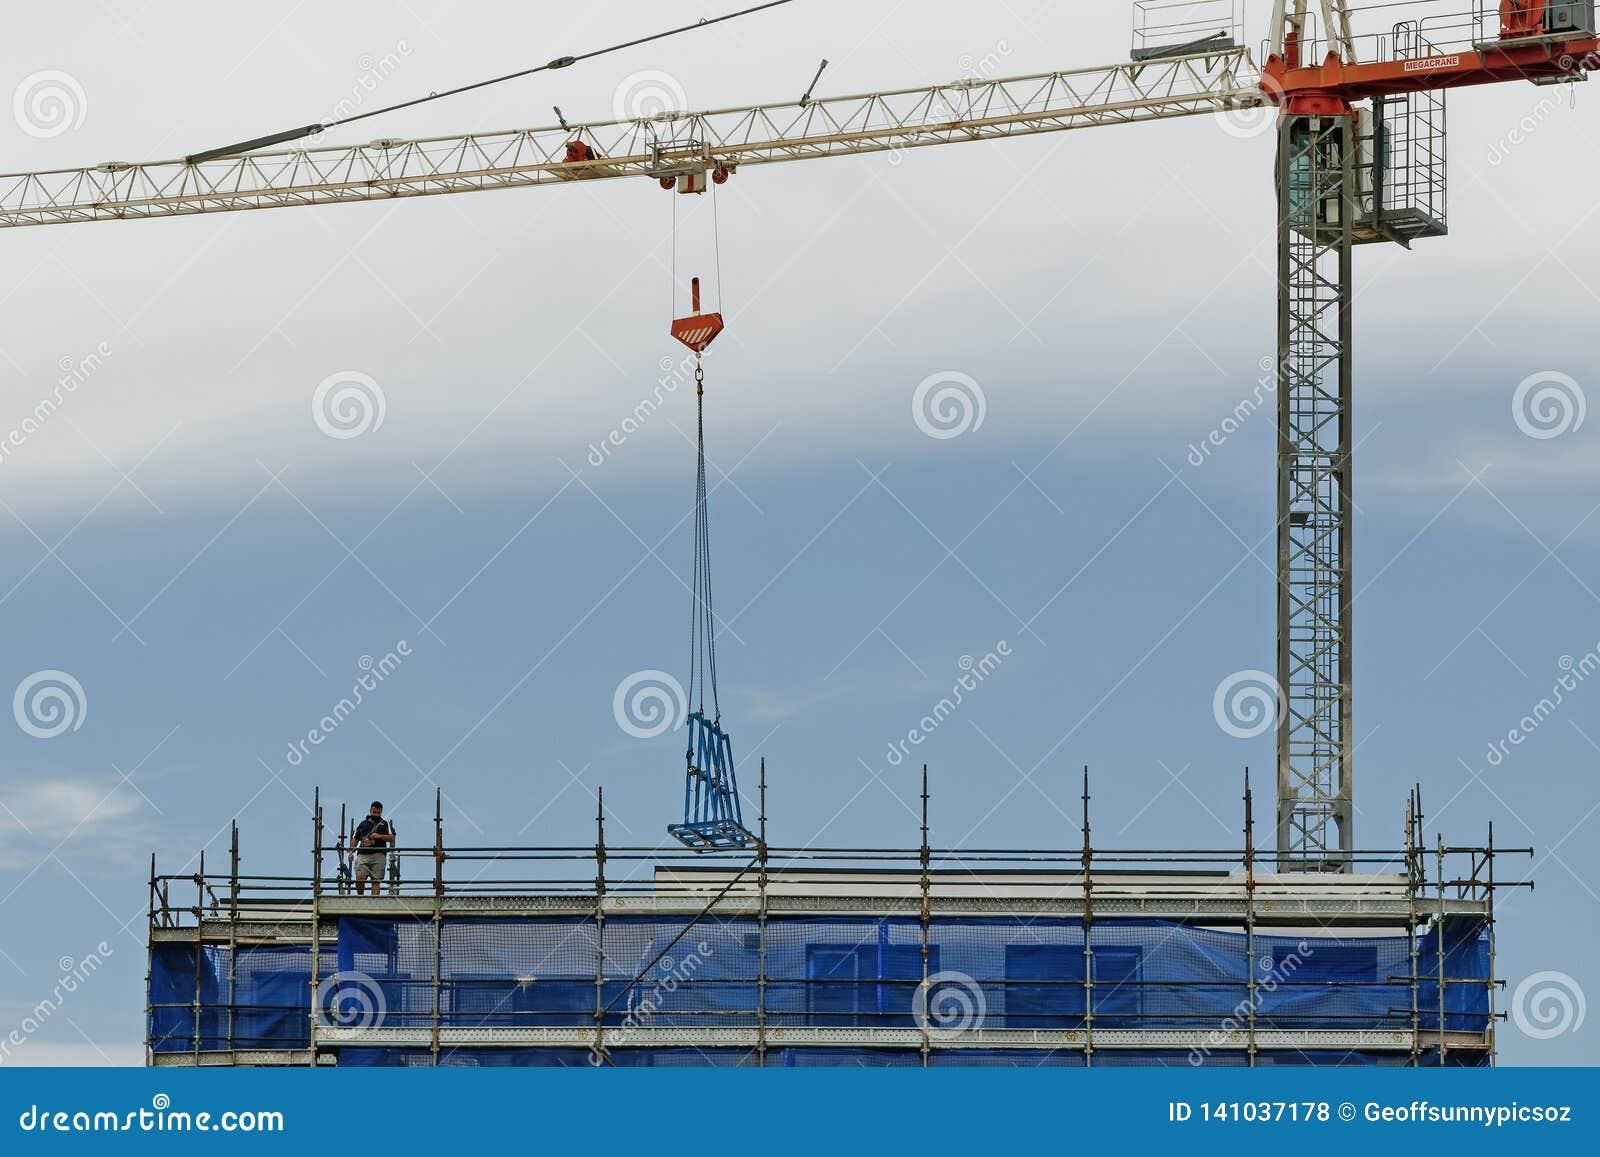 Working construction crane. Update 168. Gosford. January 2019